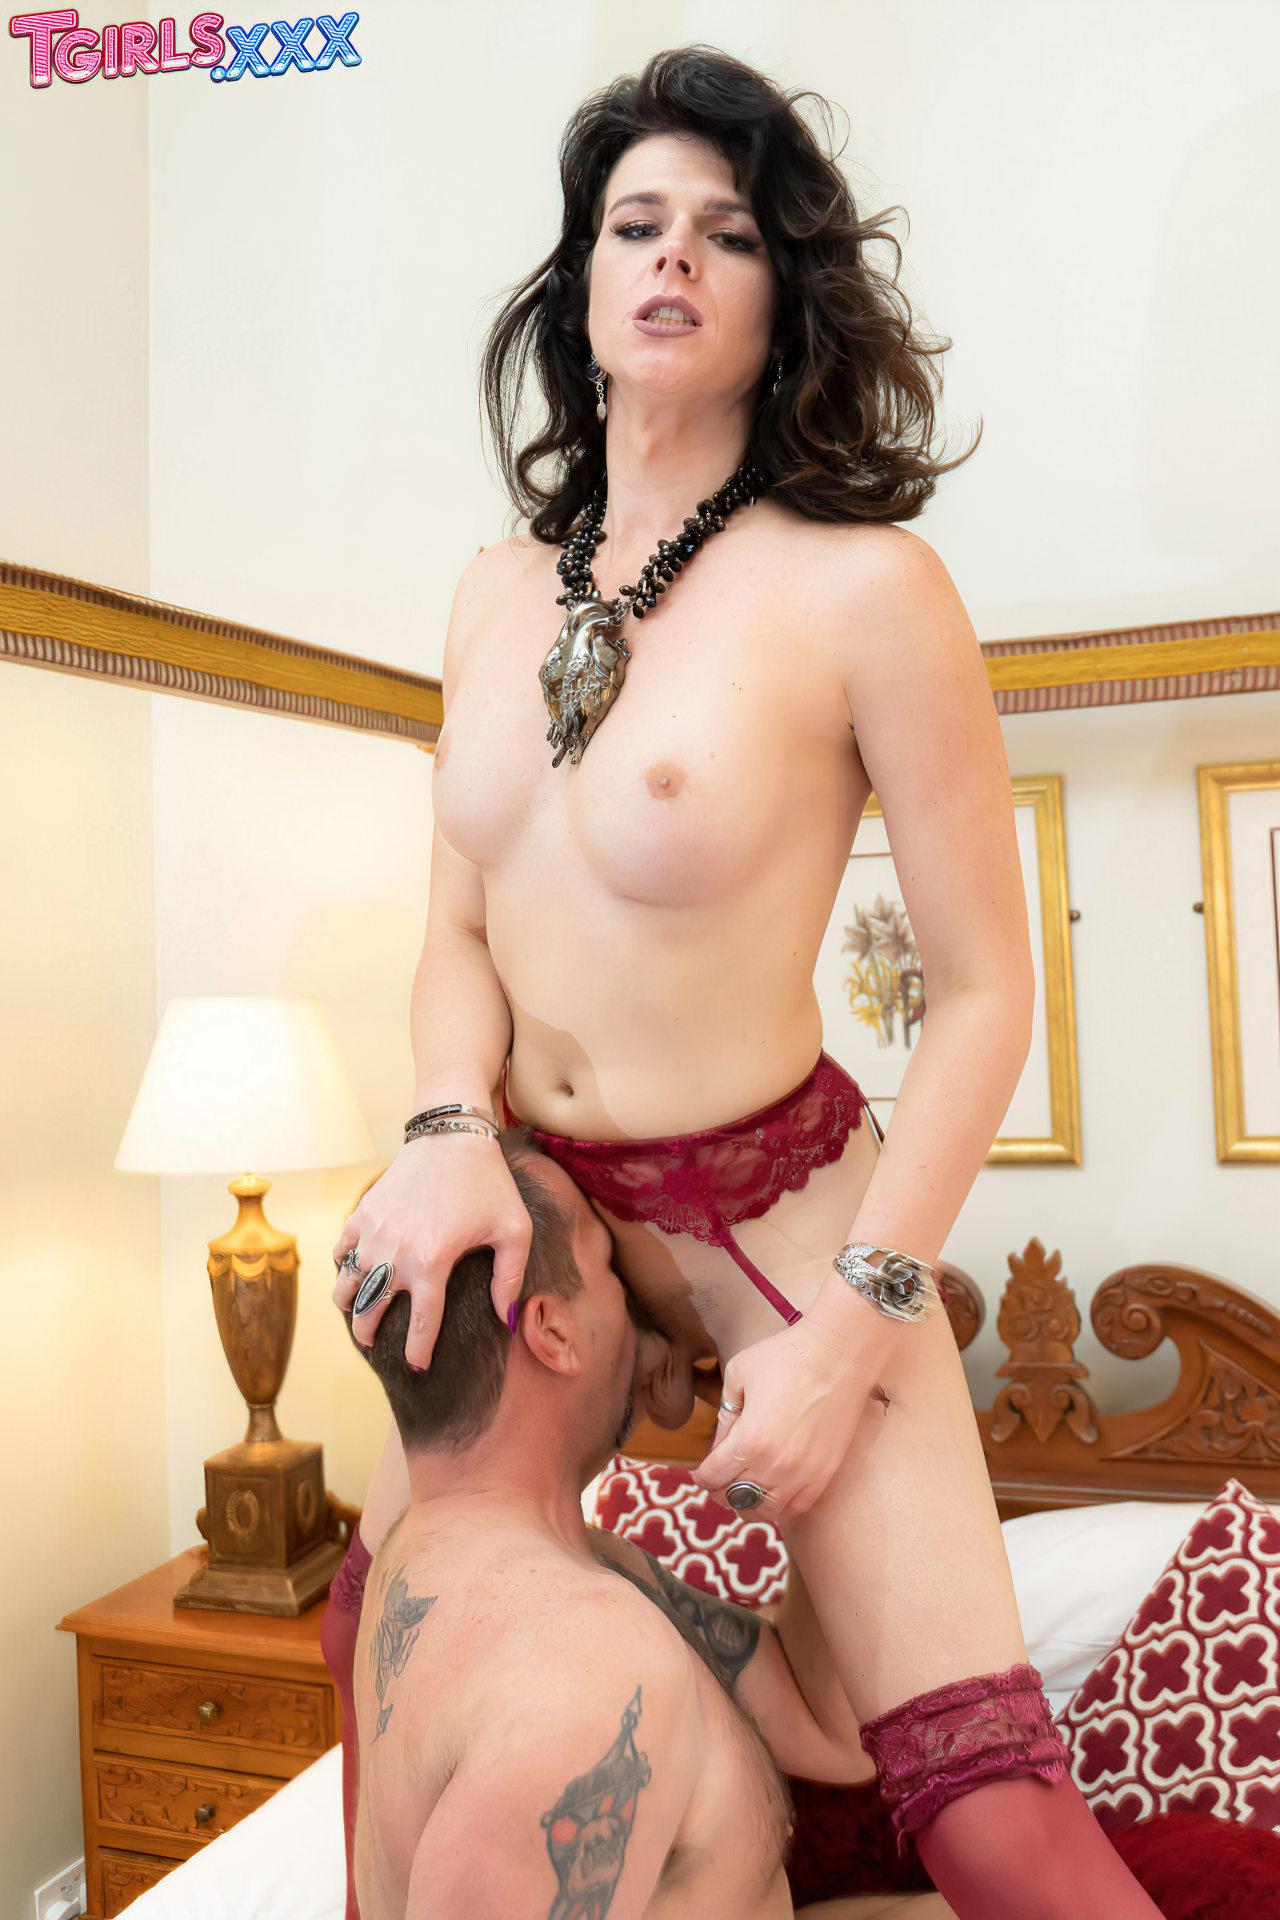 Travestis Pictures (6)